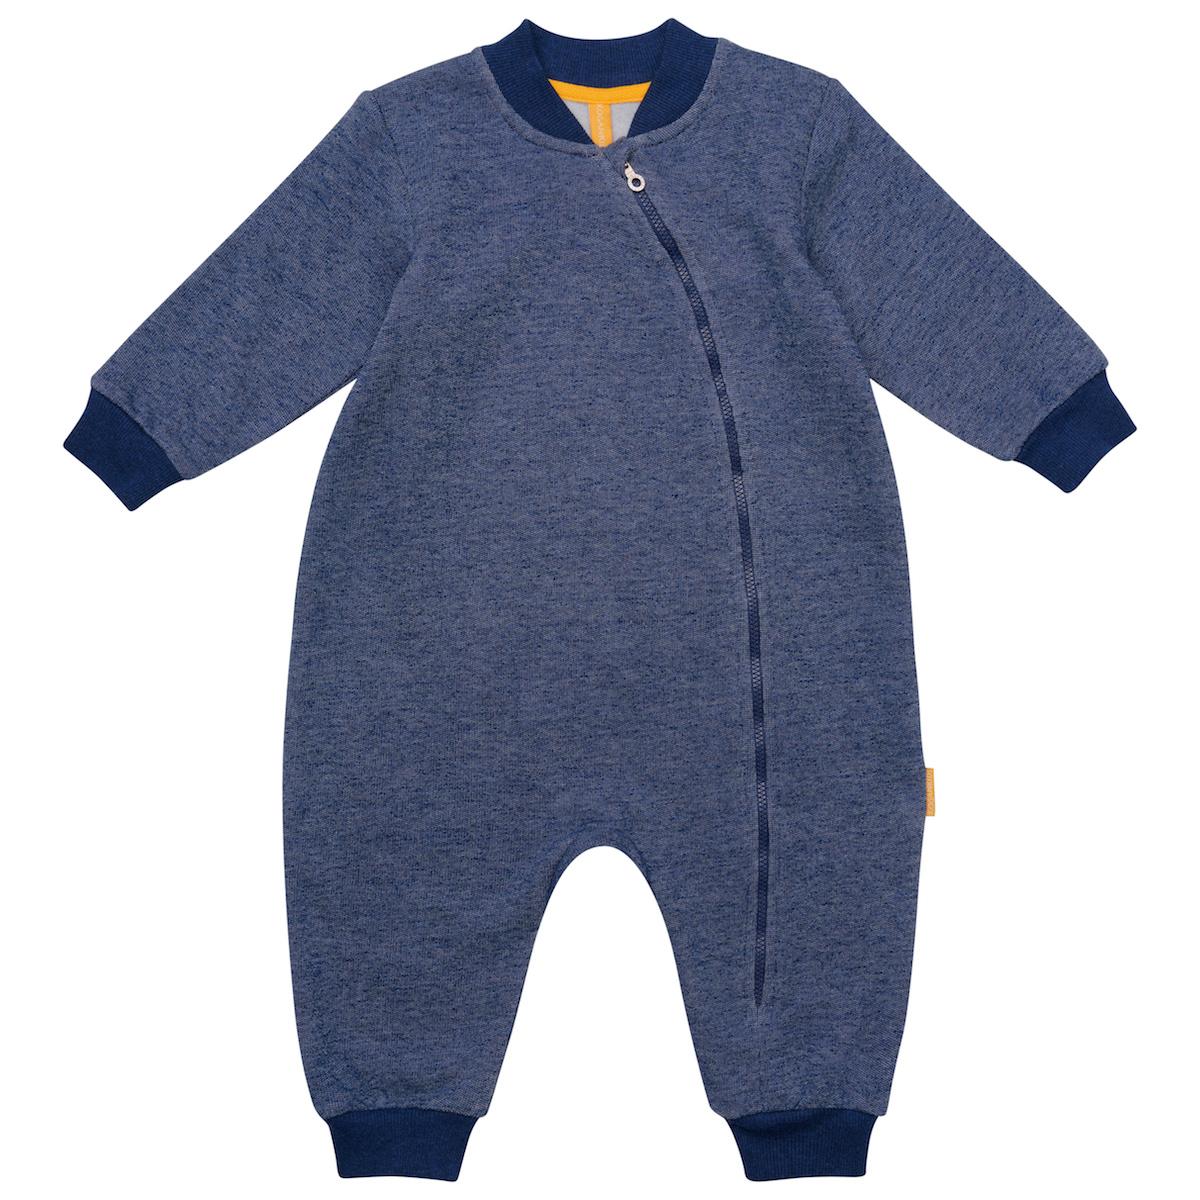 Синий комбинезон для мальчика